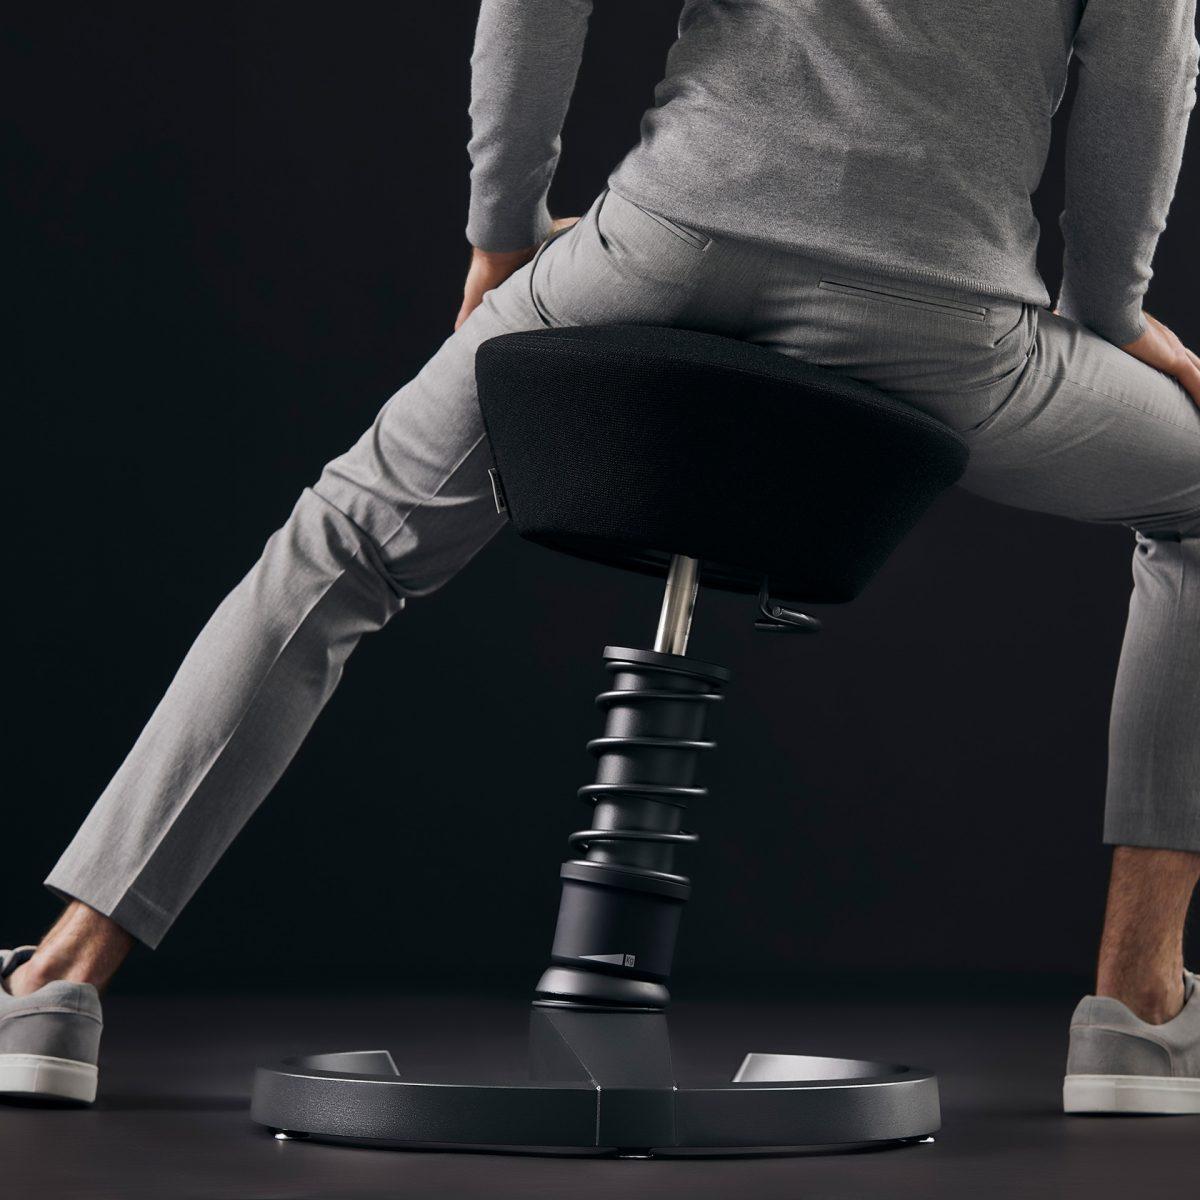 Aeris Swopper stoel Sfeerbeeld2 Thuis WEB